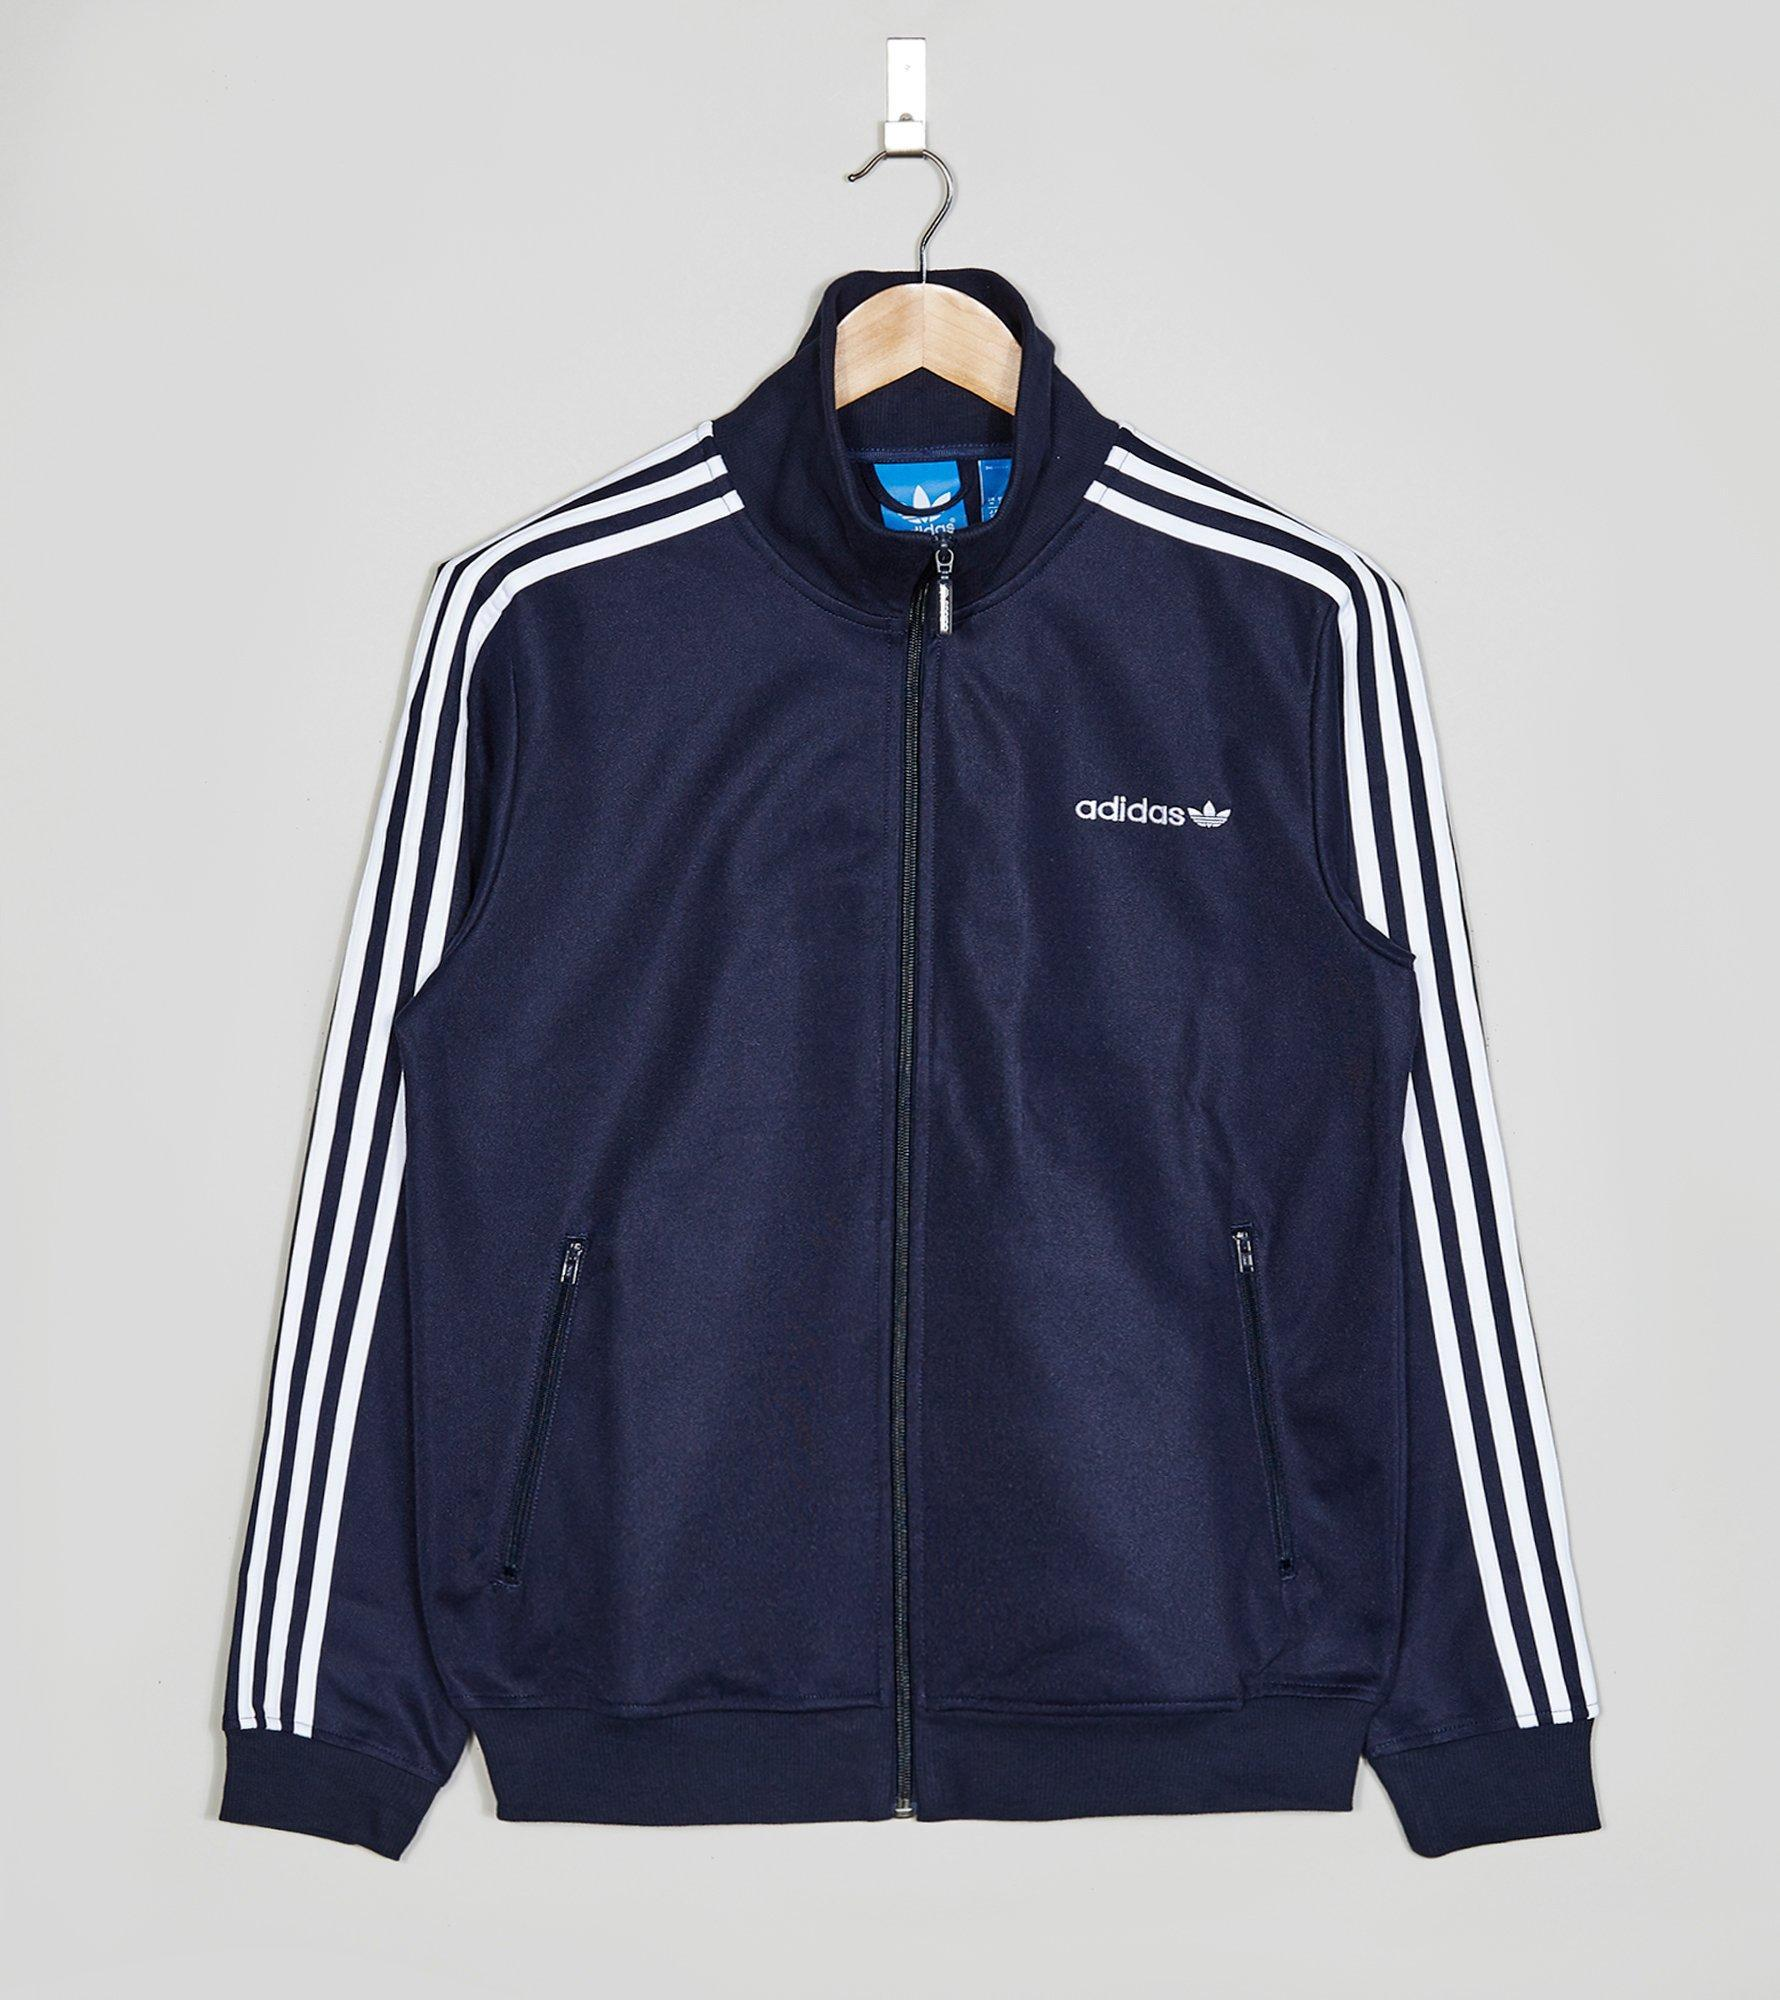 lyst adidas originals beckenbauer track jacket in blue. Black Bedroom Furniture Sets. Home Design Ideas